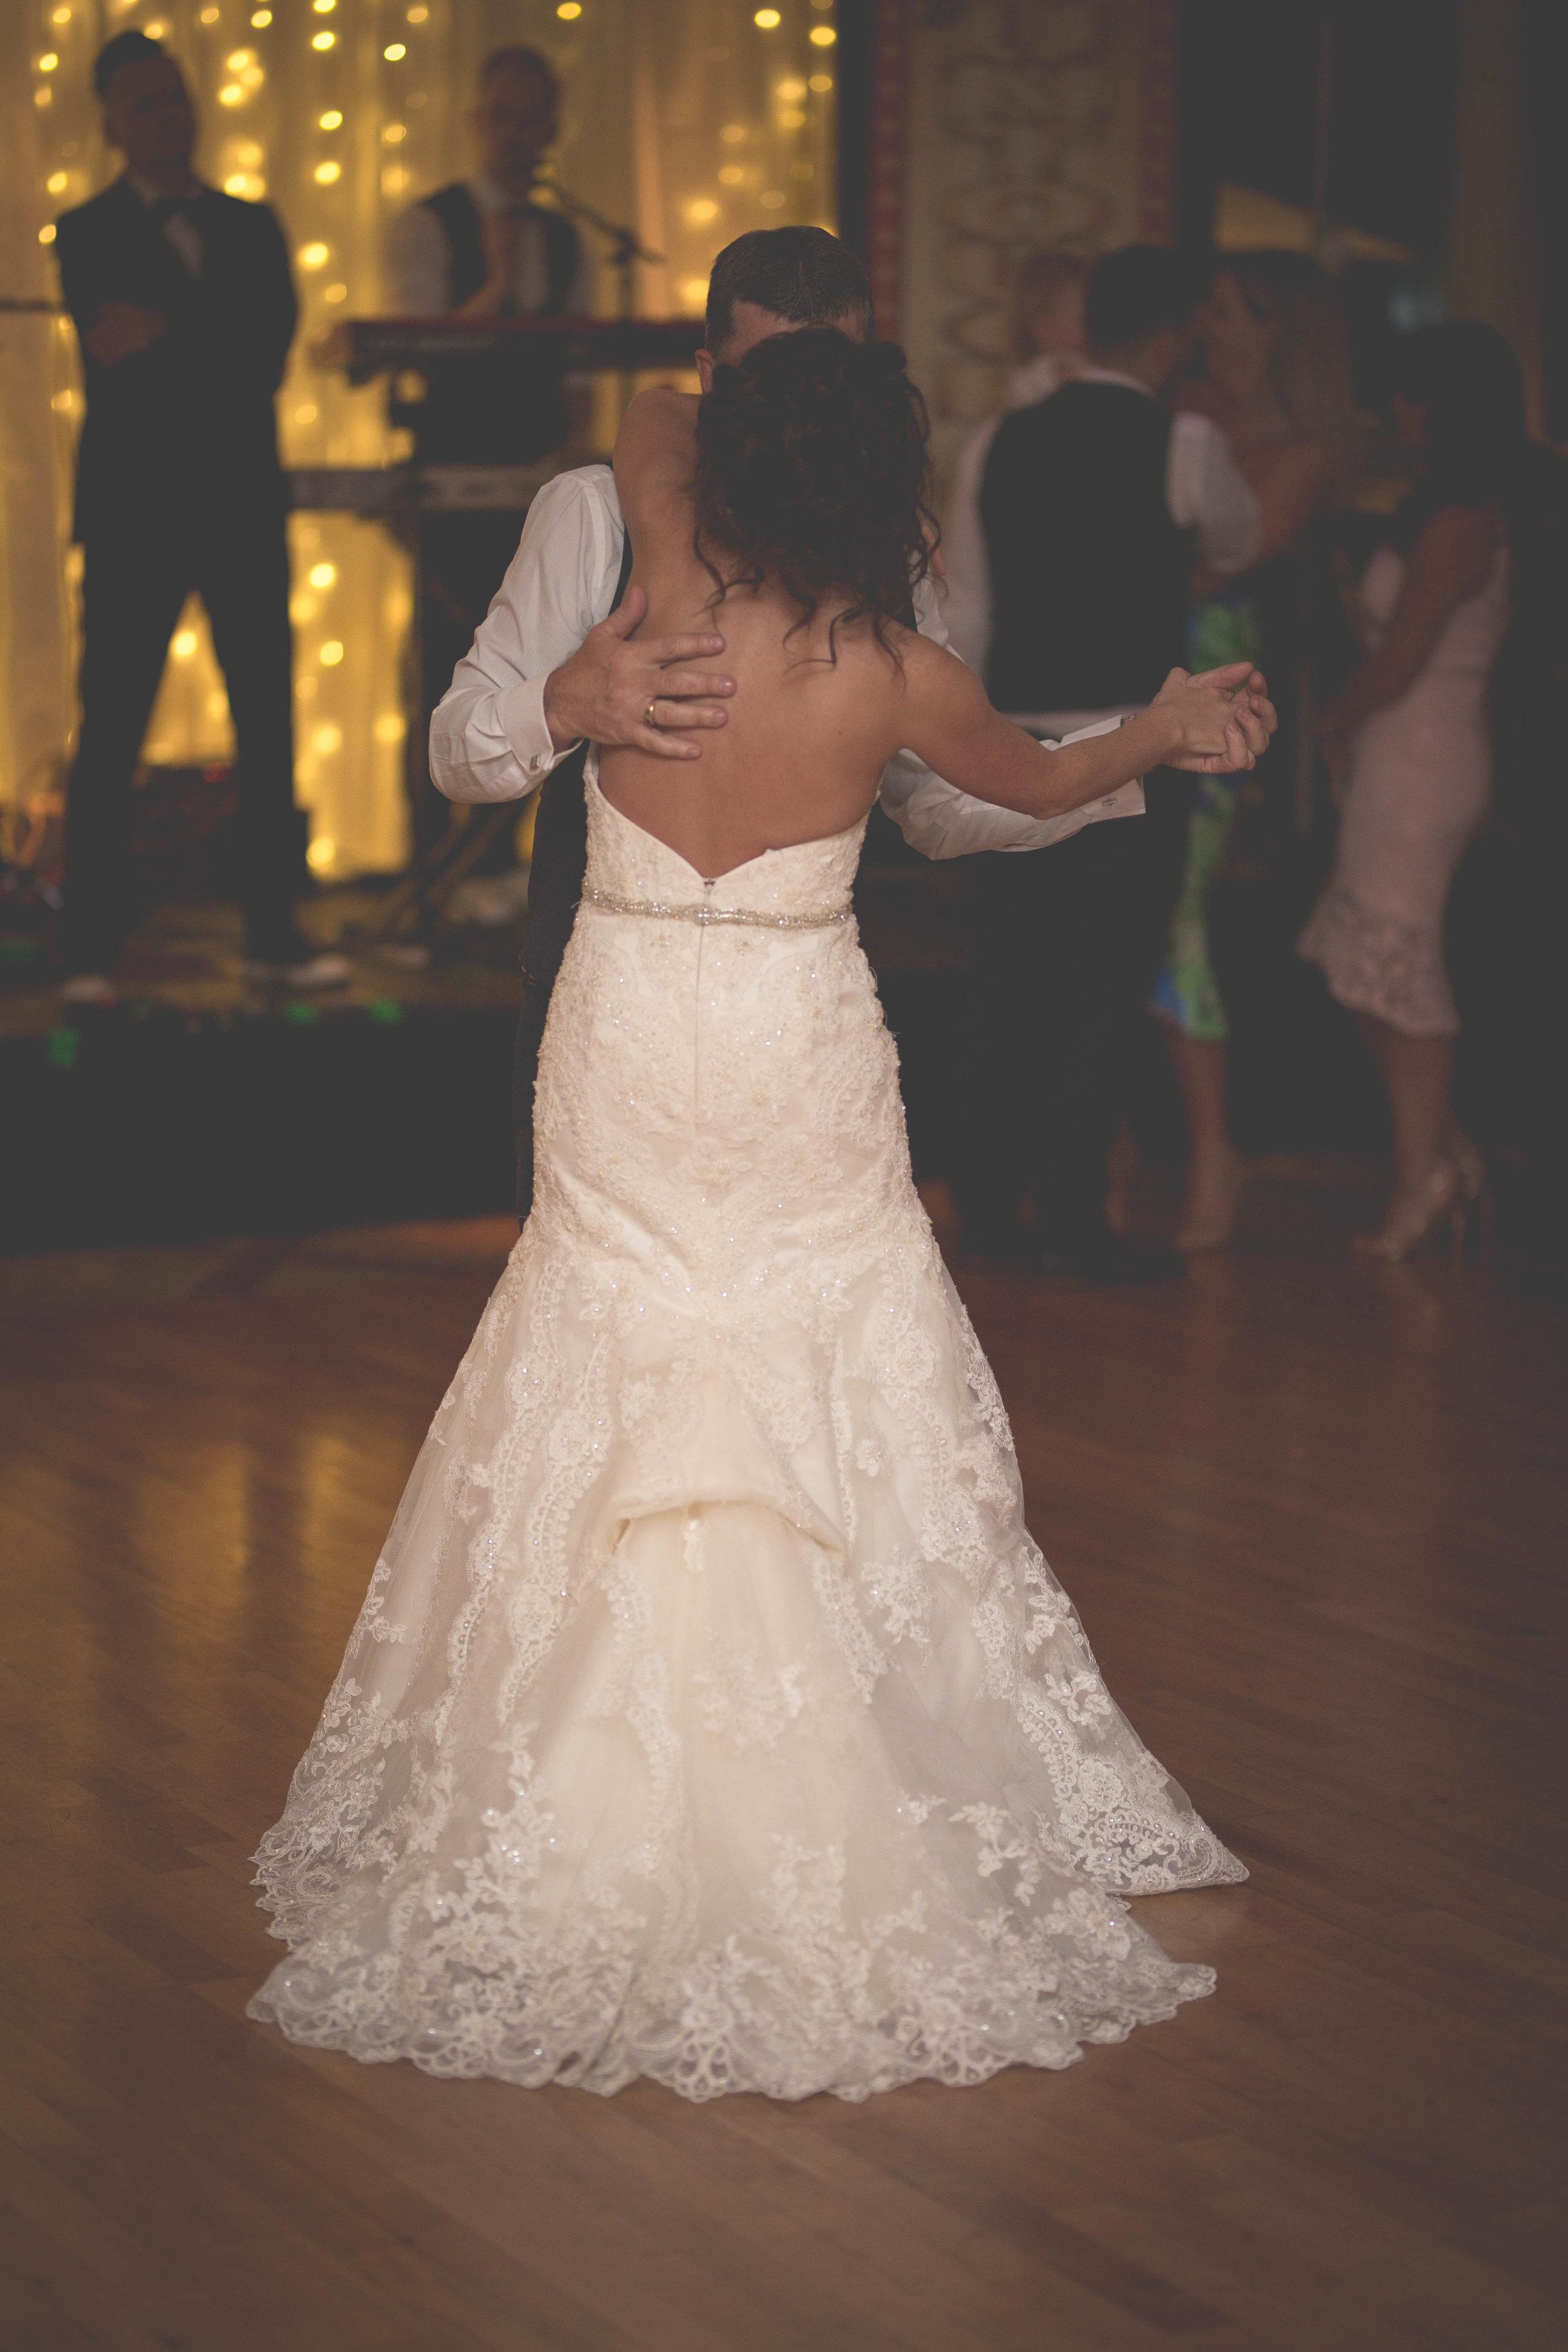 Aisling & Andy - First Dance-35.jpg